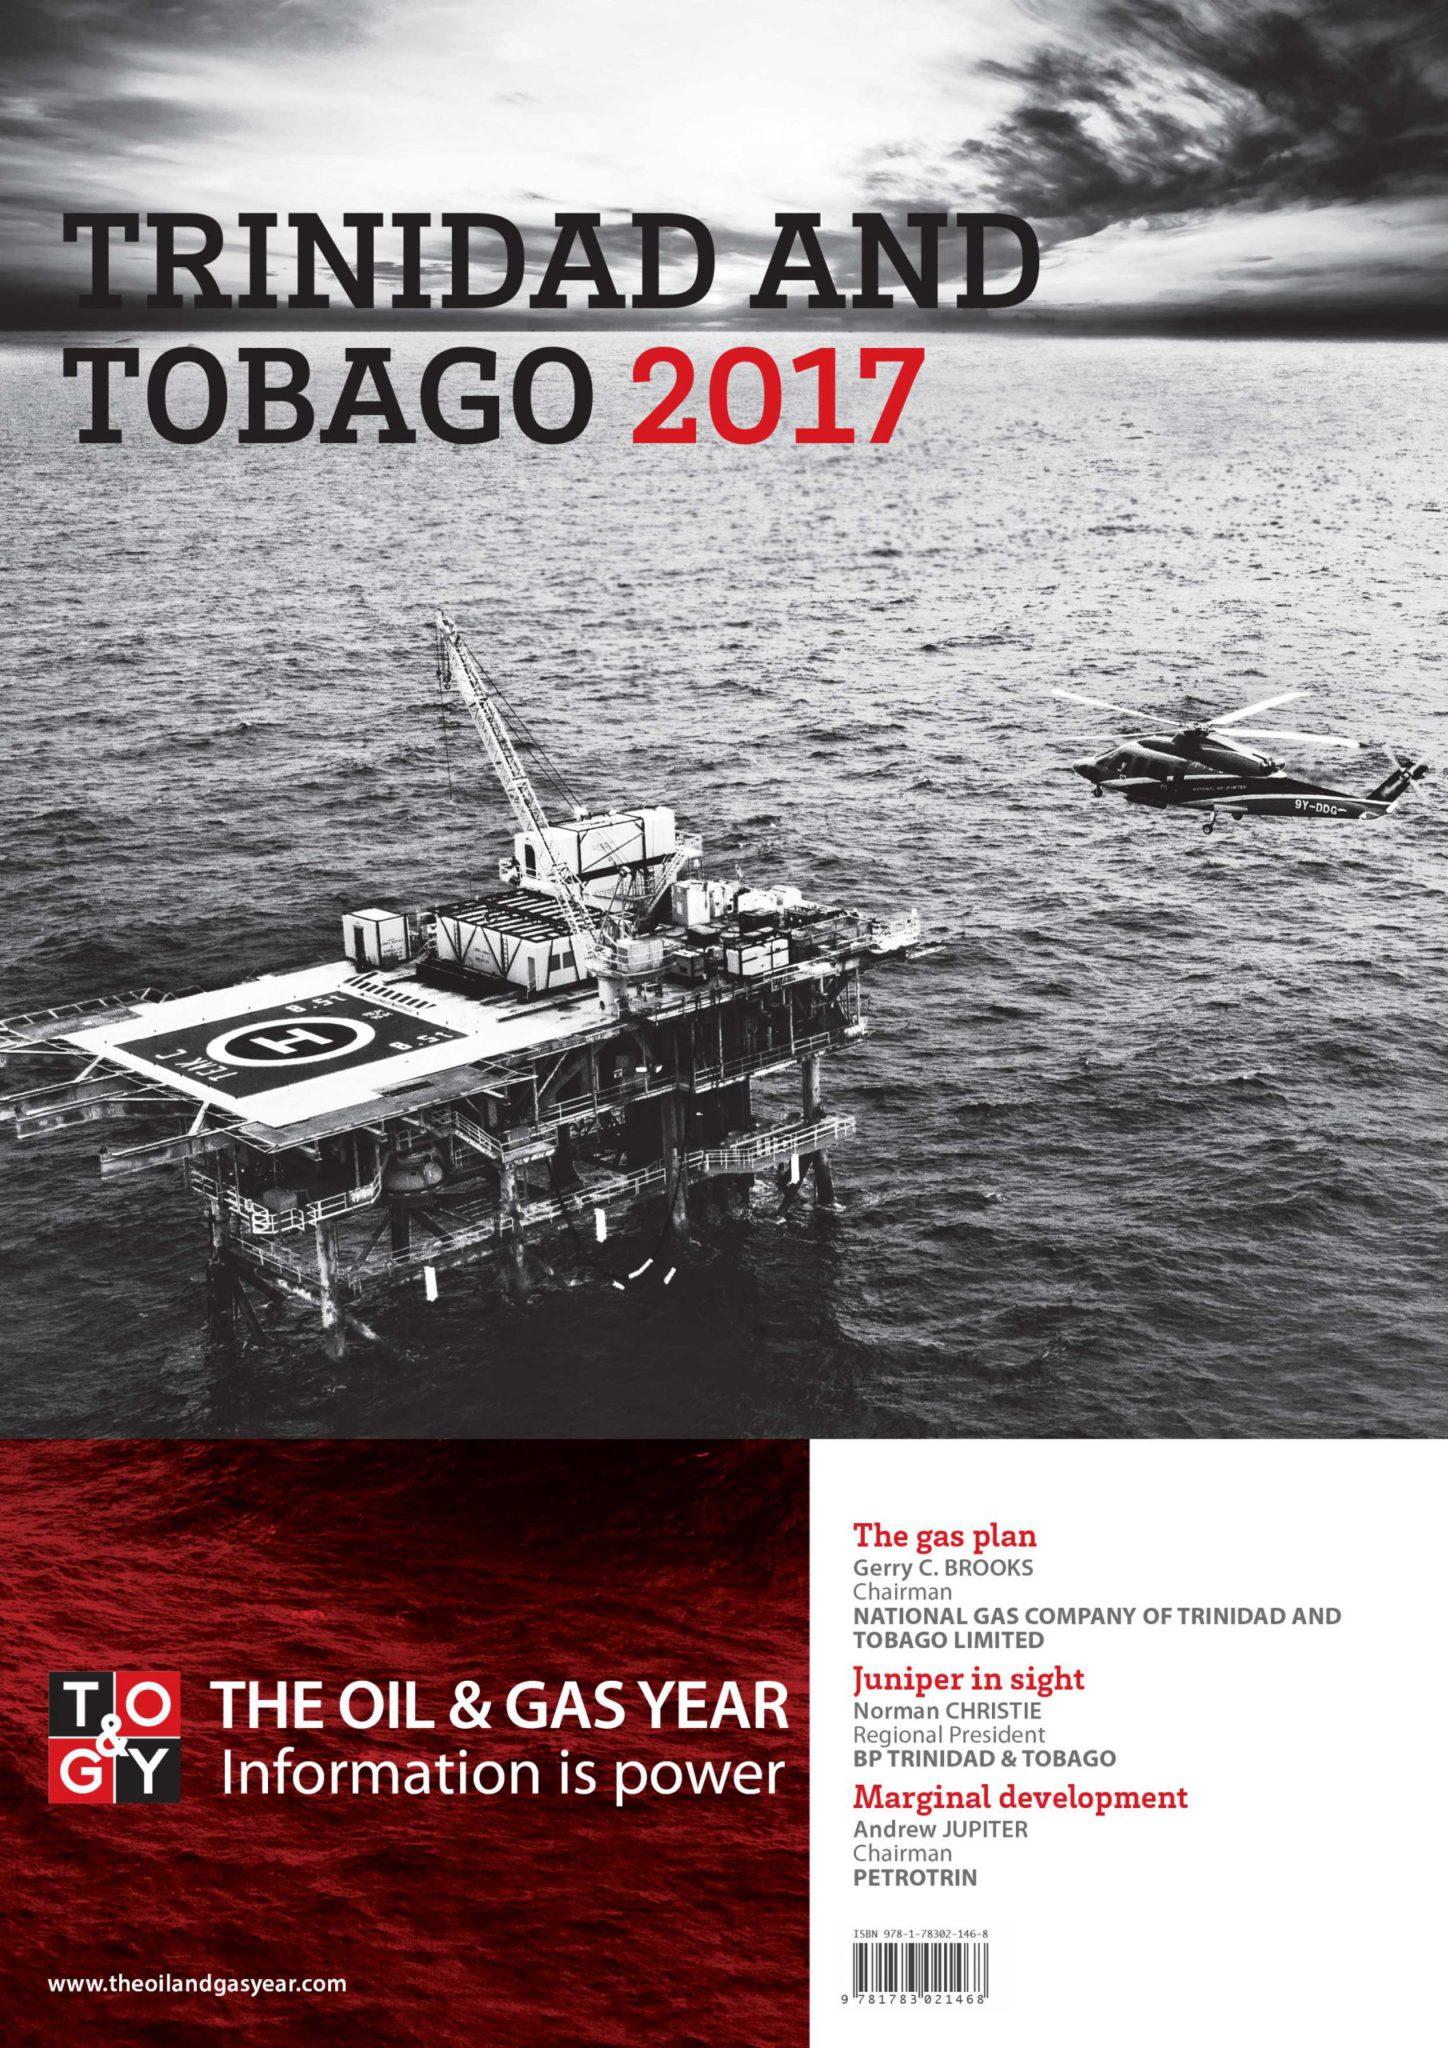 trinidadtobago_2017